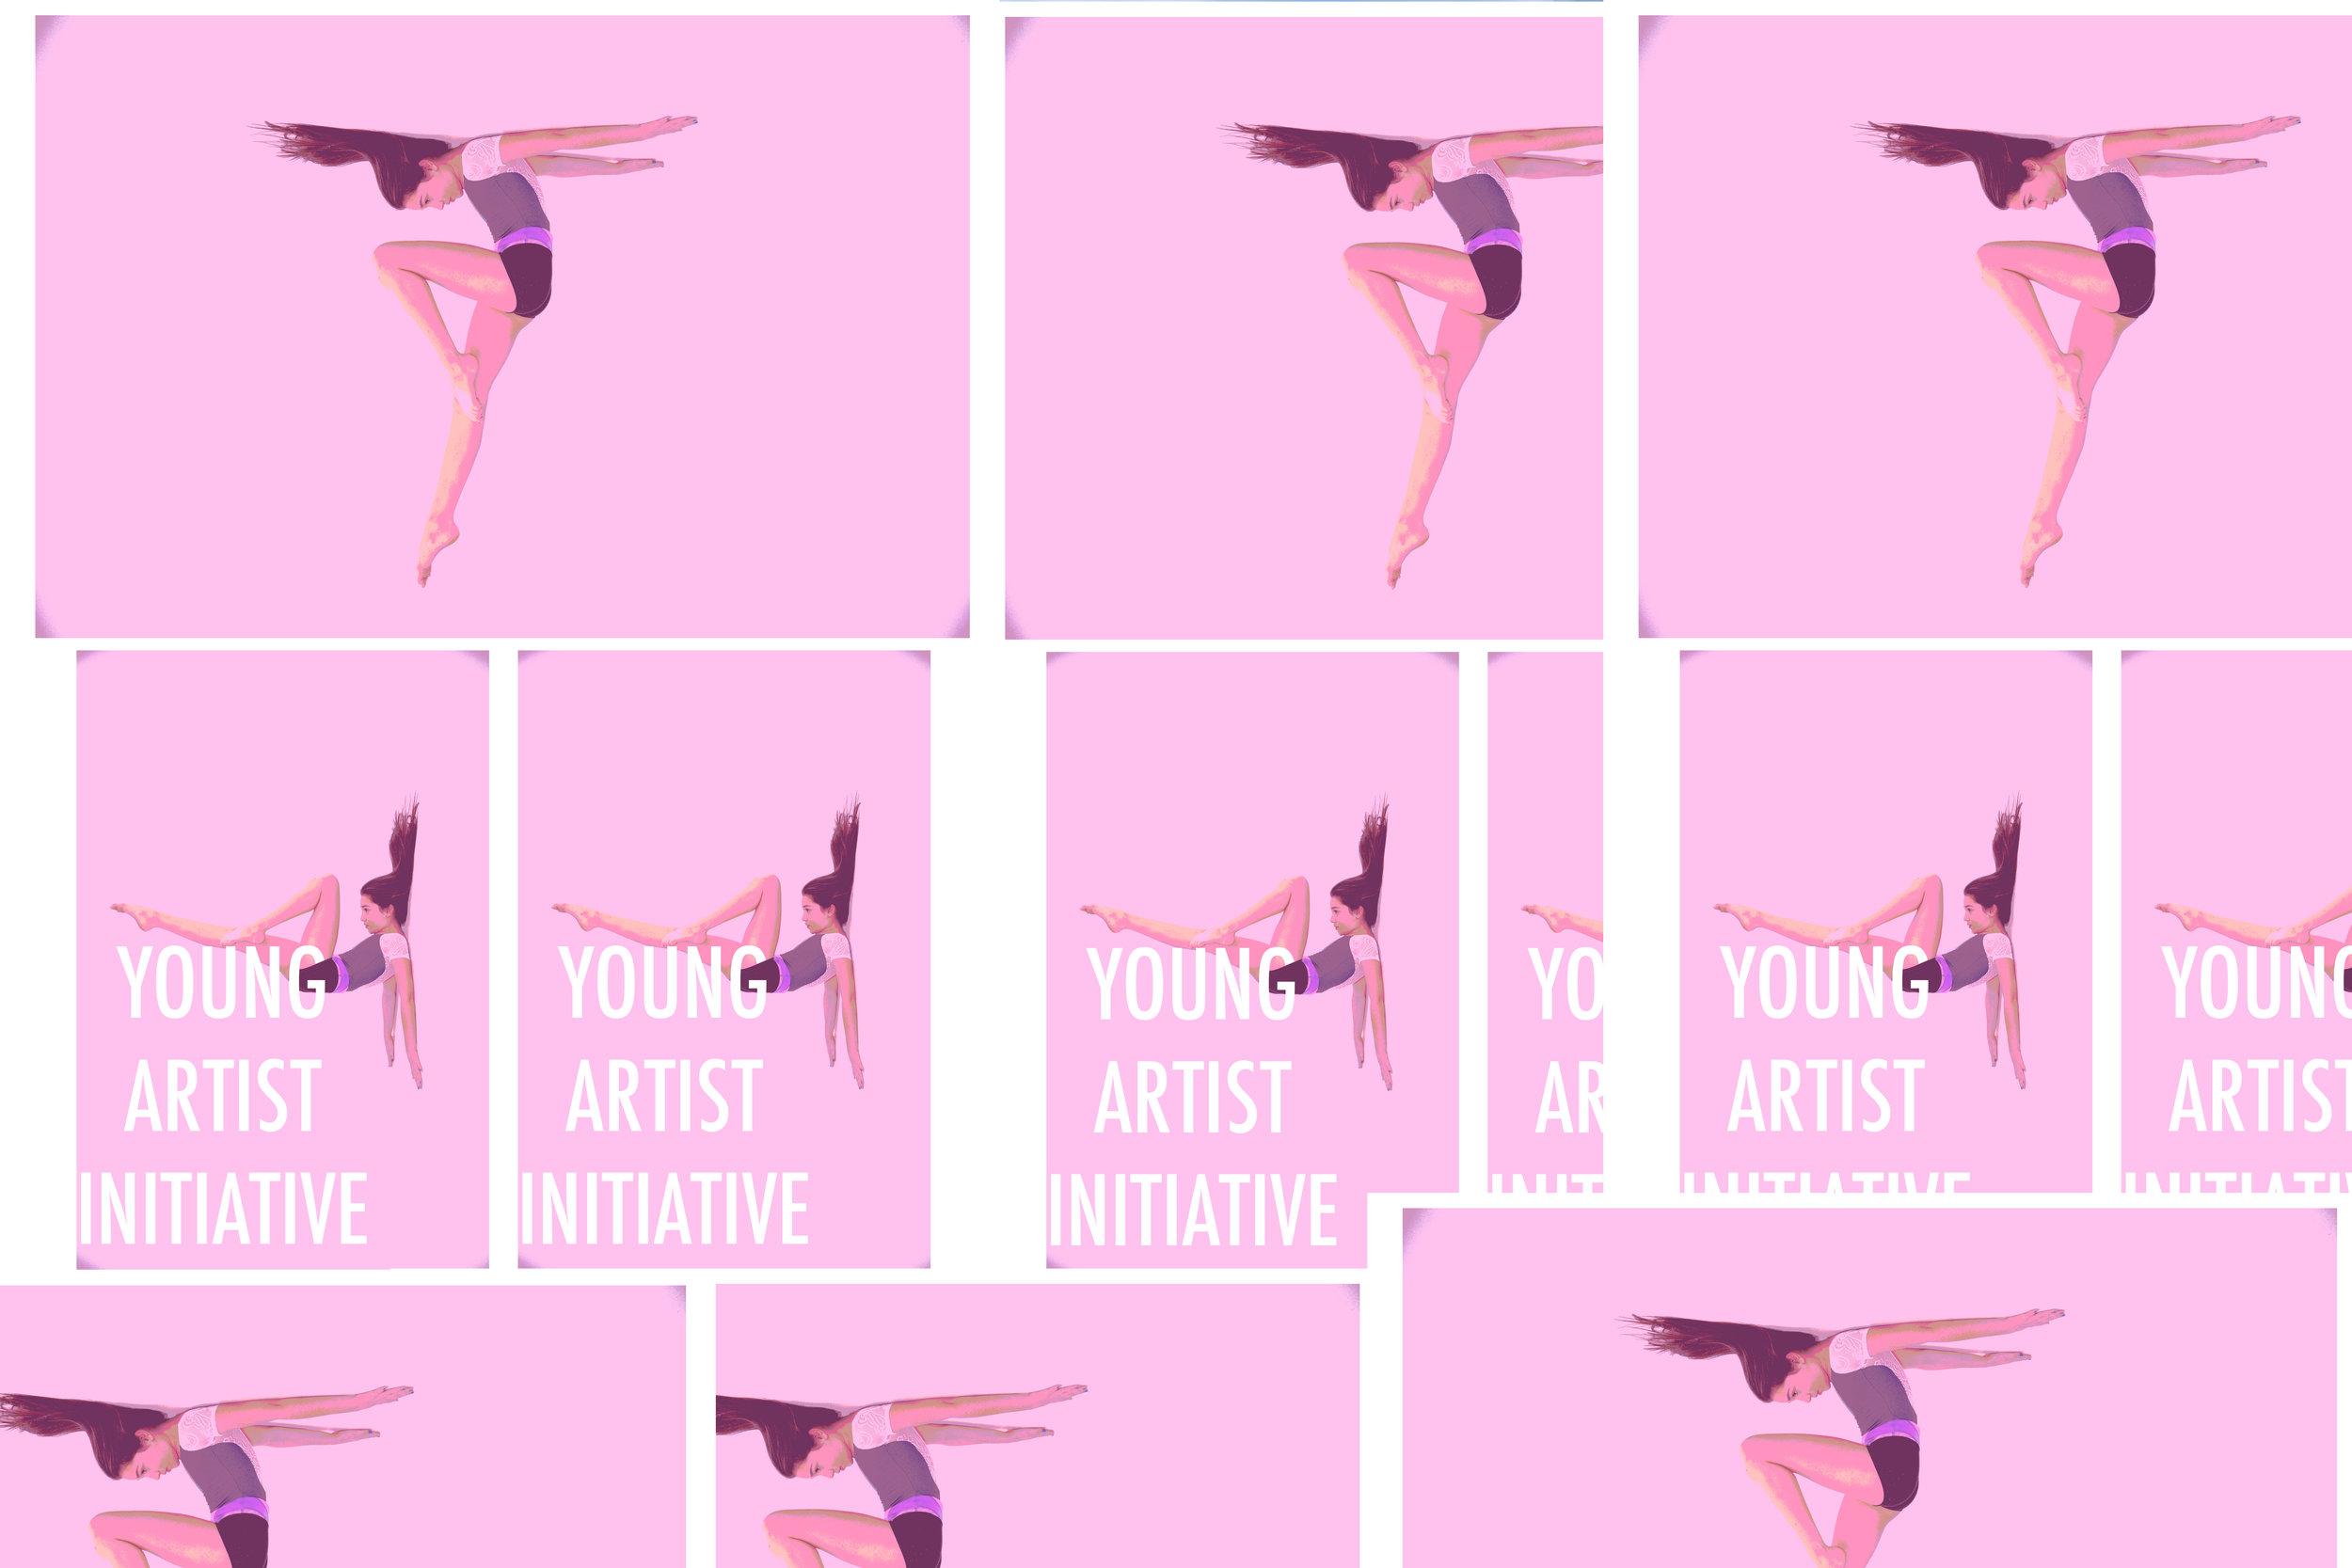 yaistackpage.jpg